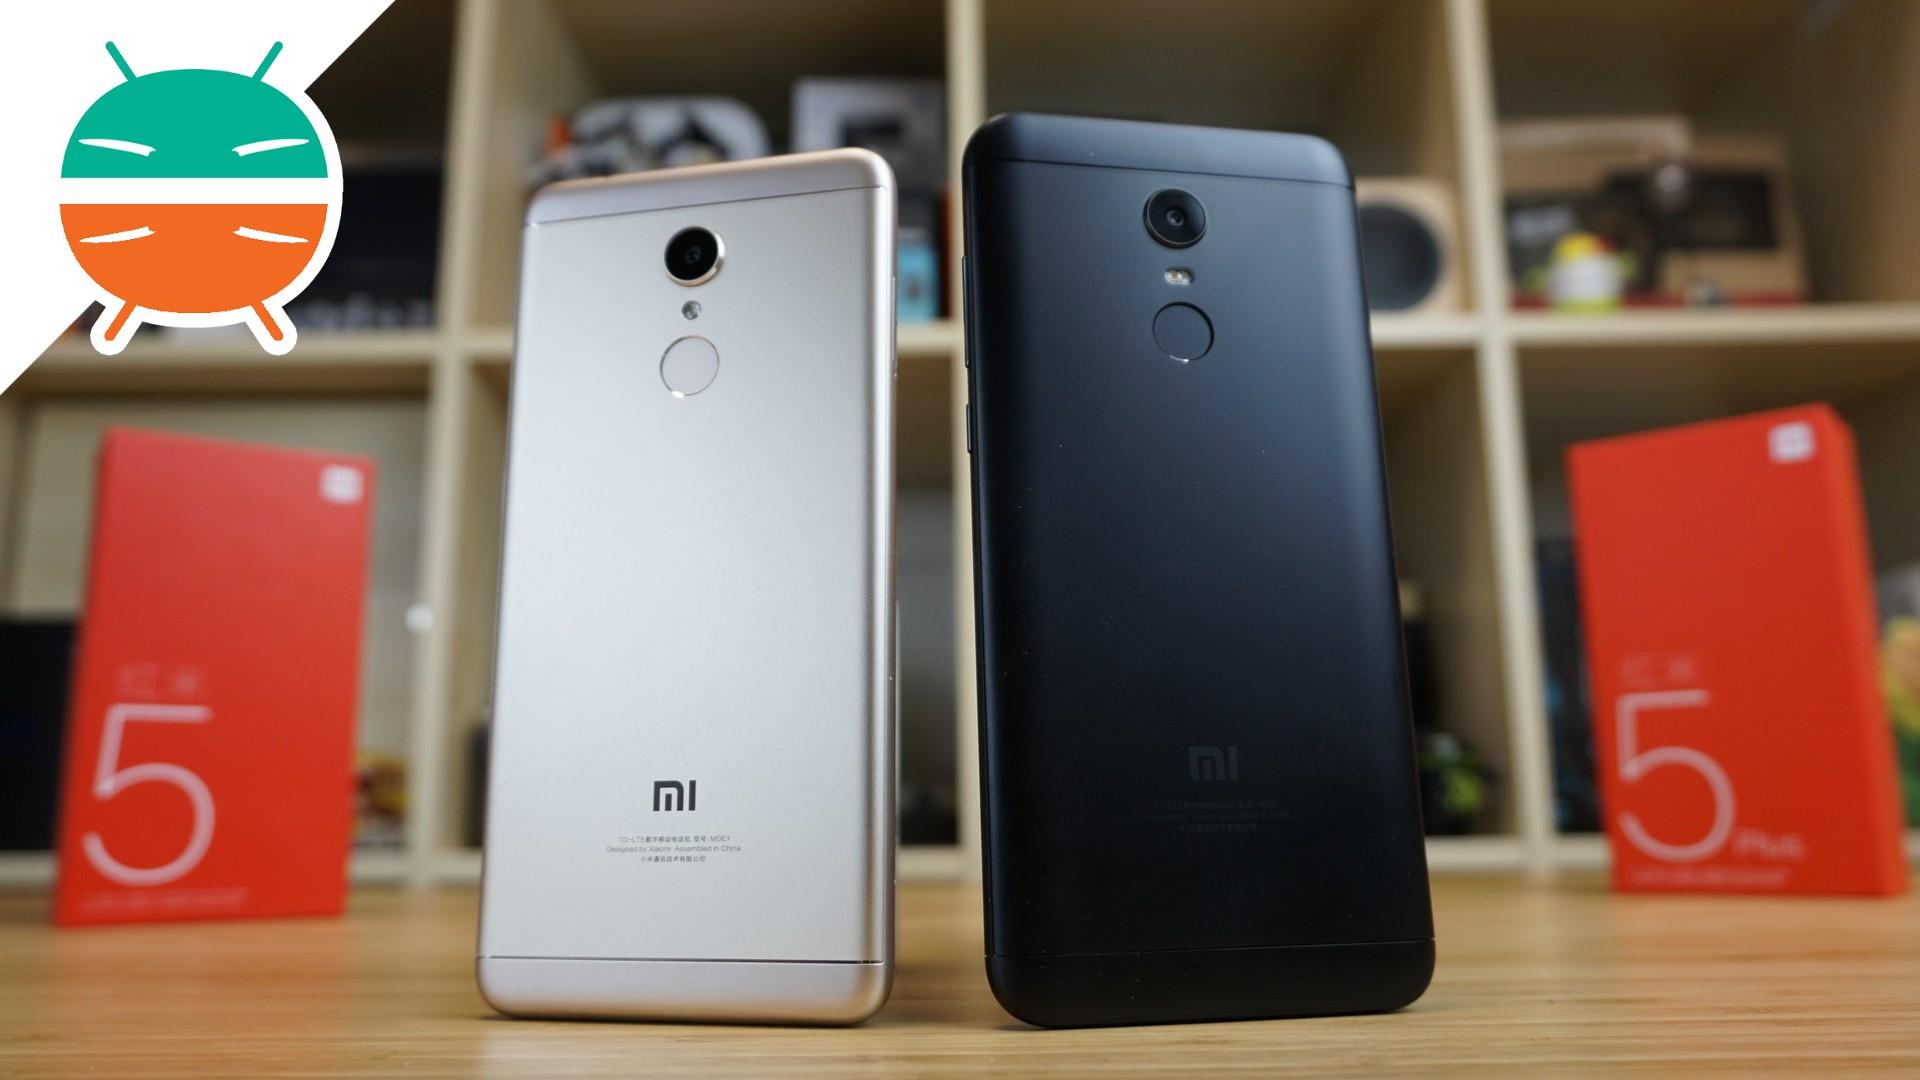 Xiaomi Redmi 5 3/32 GB – Banggood